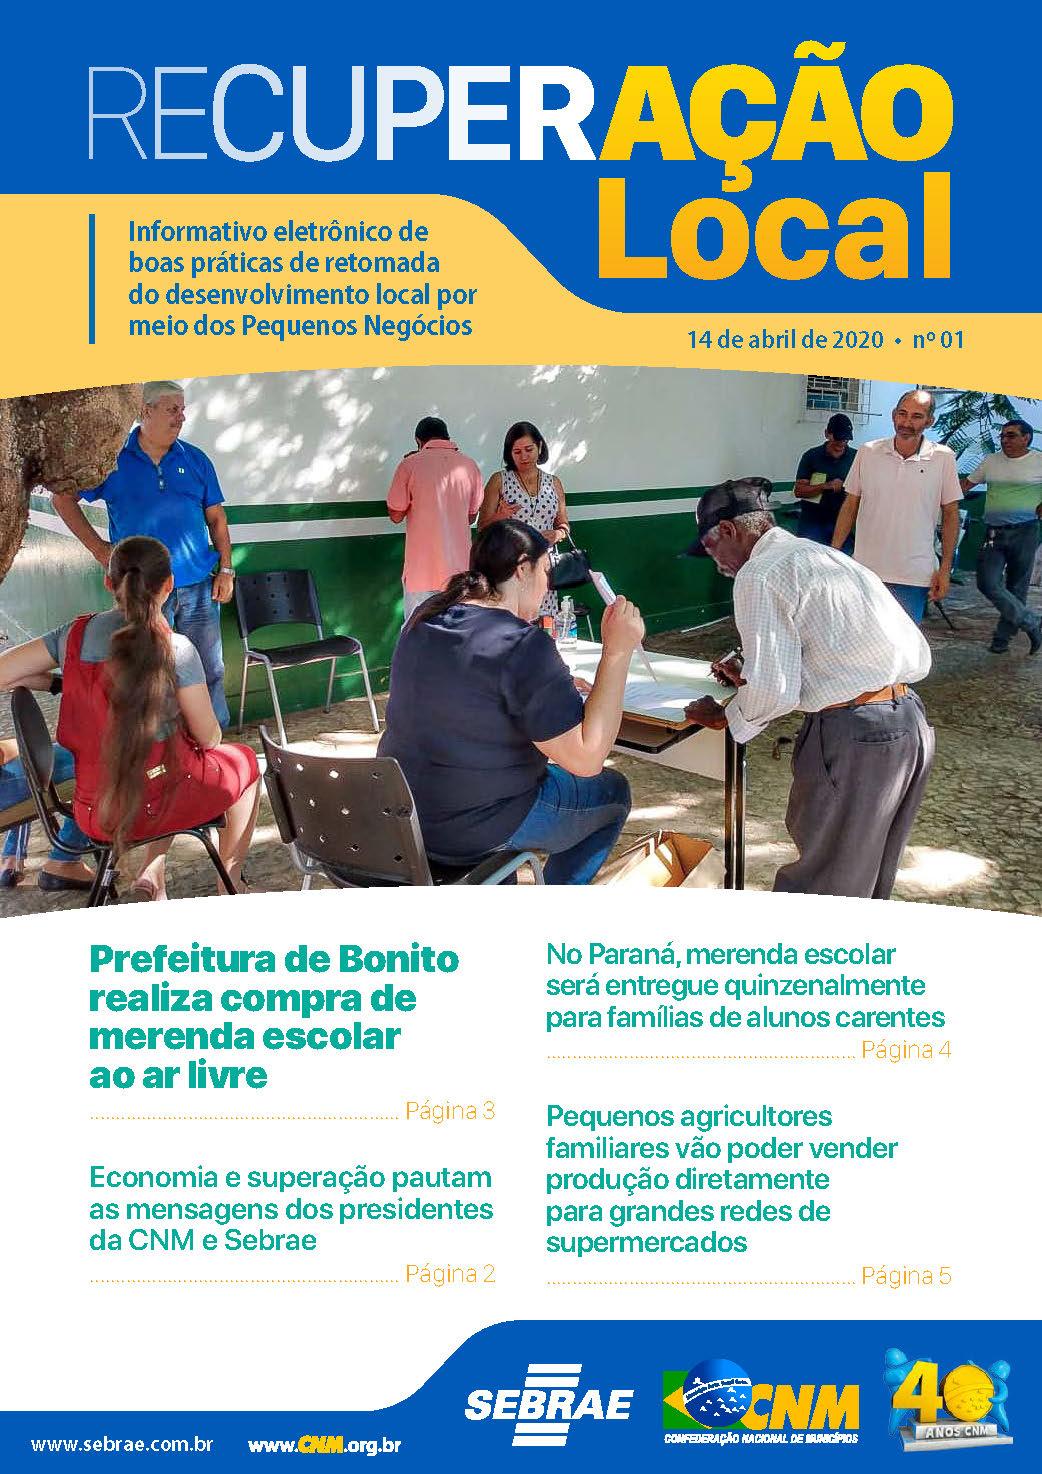 Recuperacao Local Pagina 1